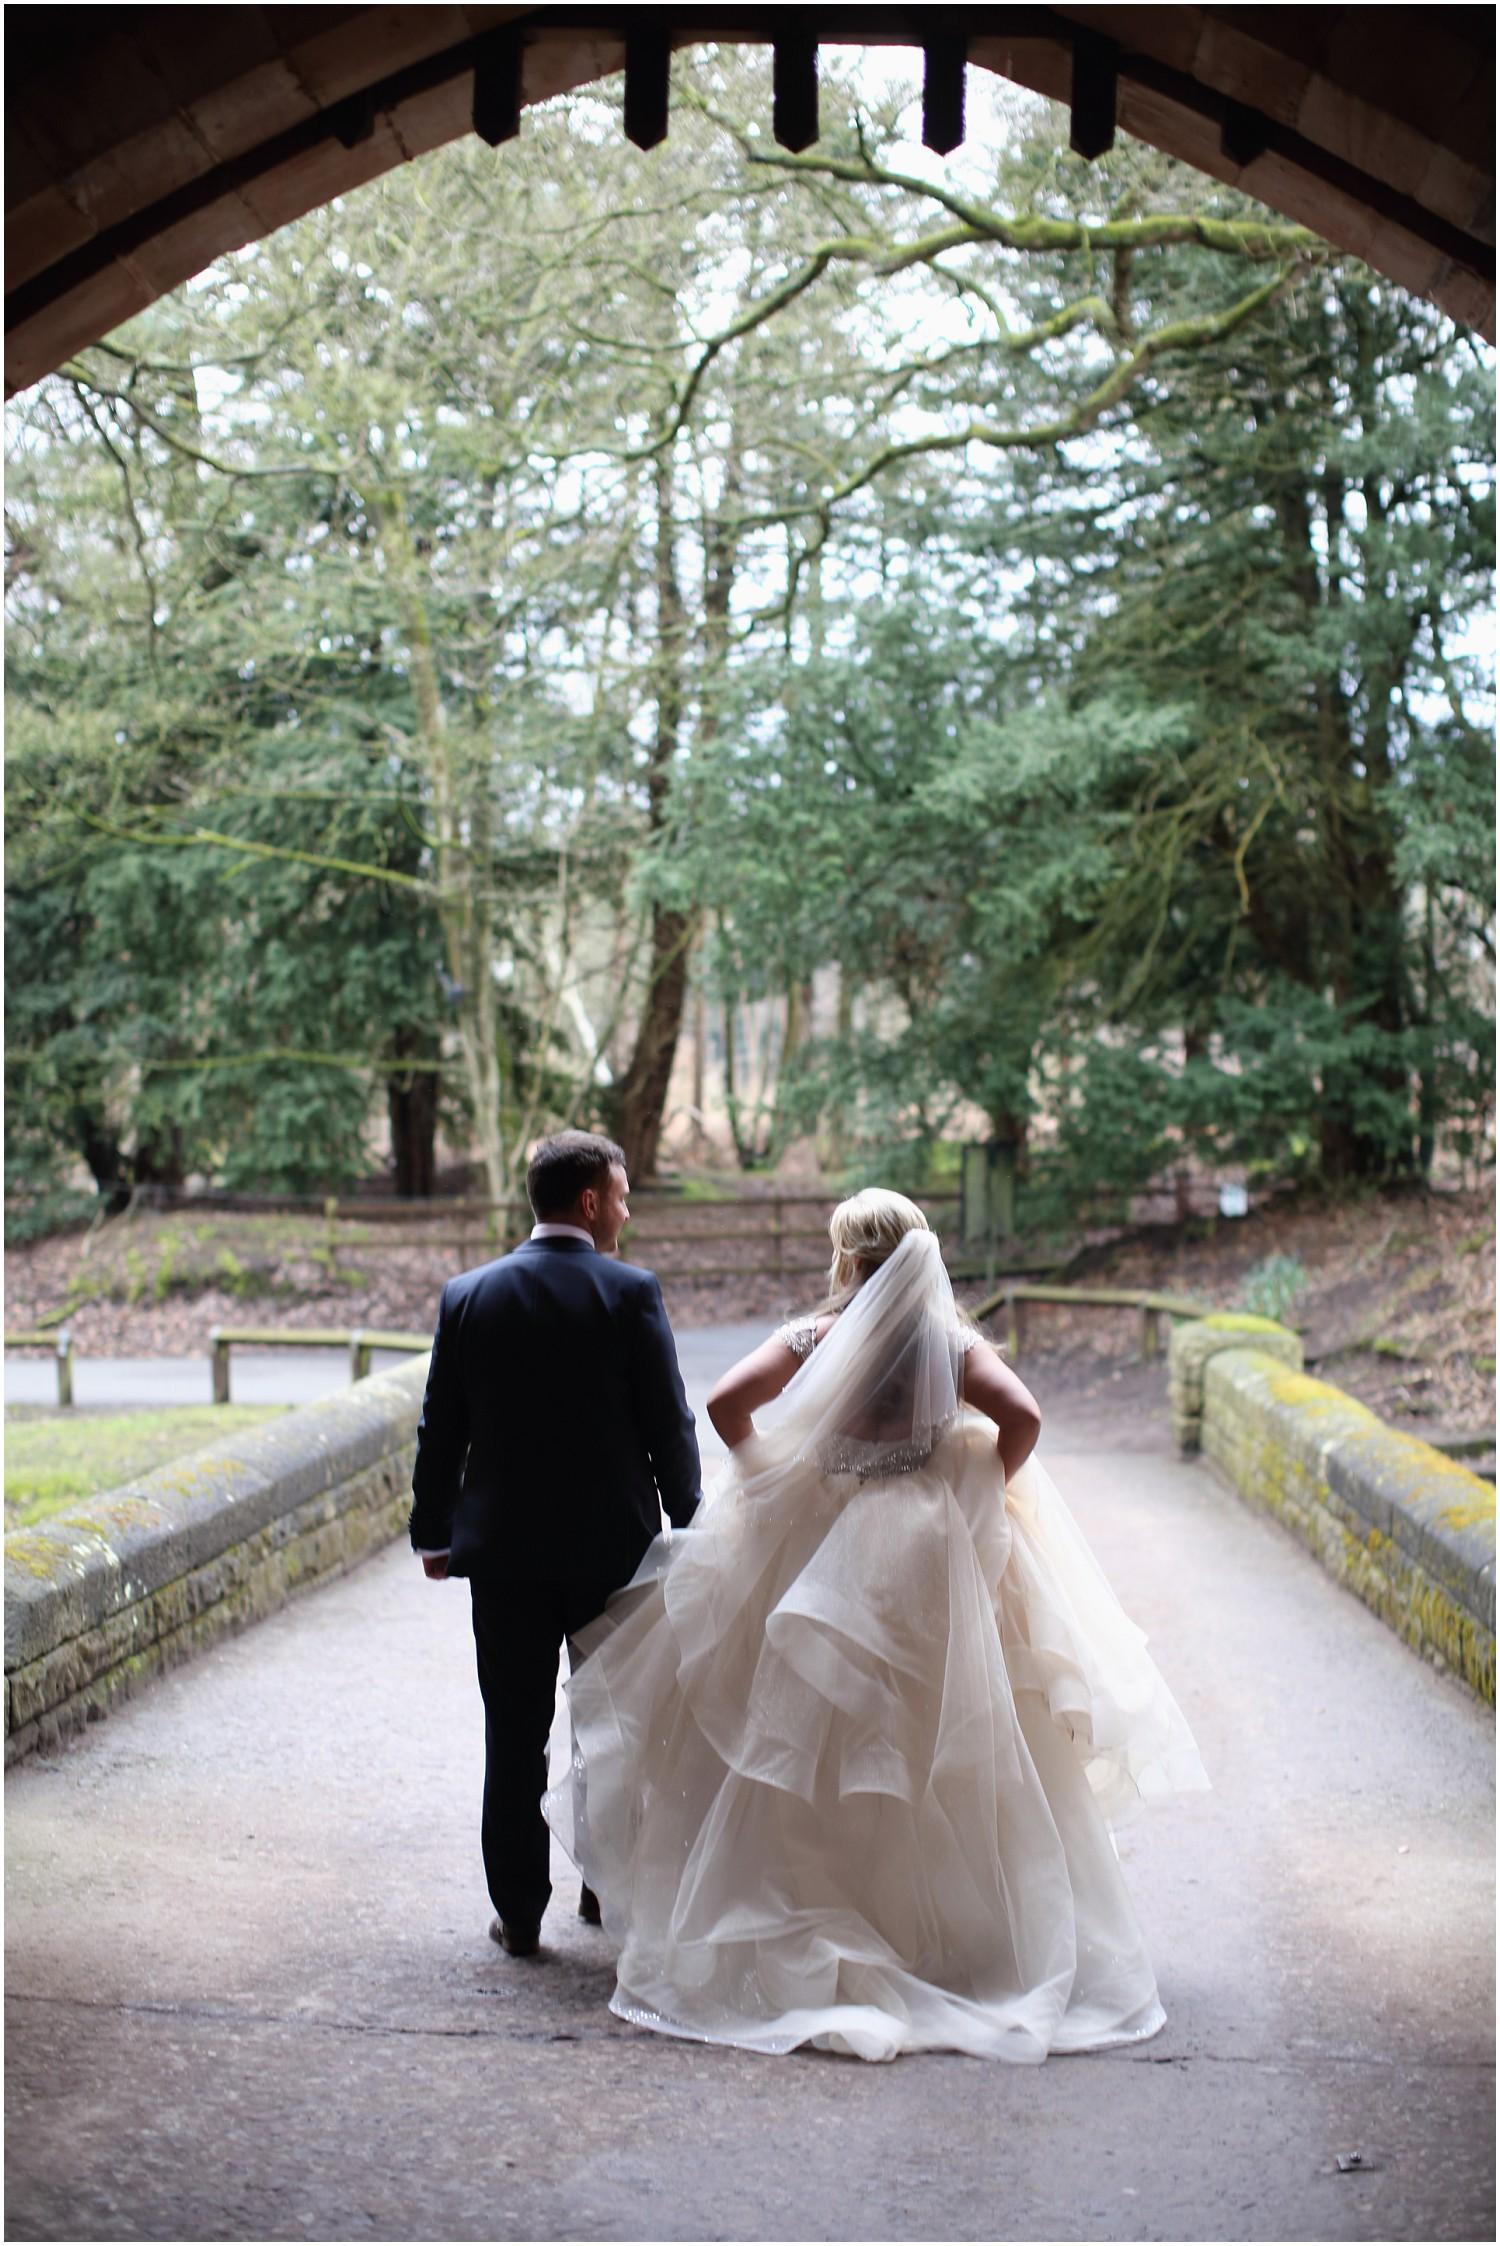 bride and groom from behind walking